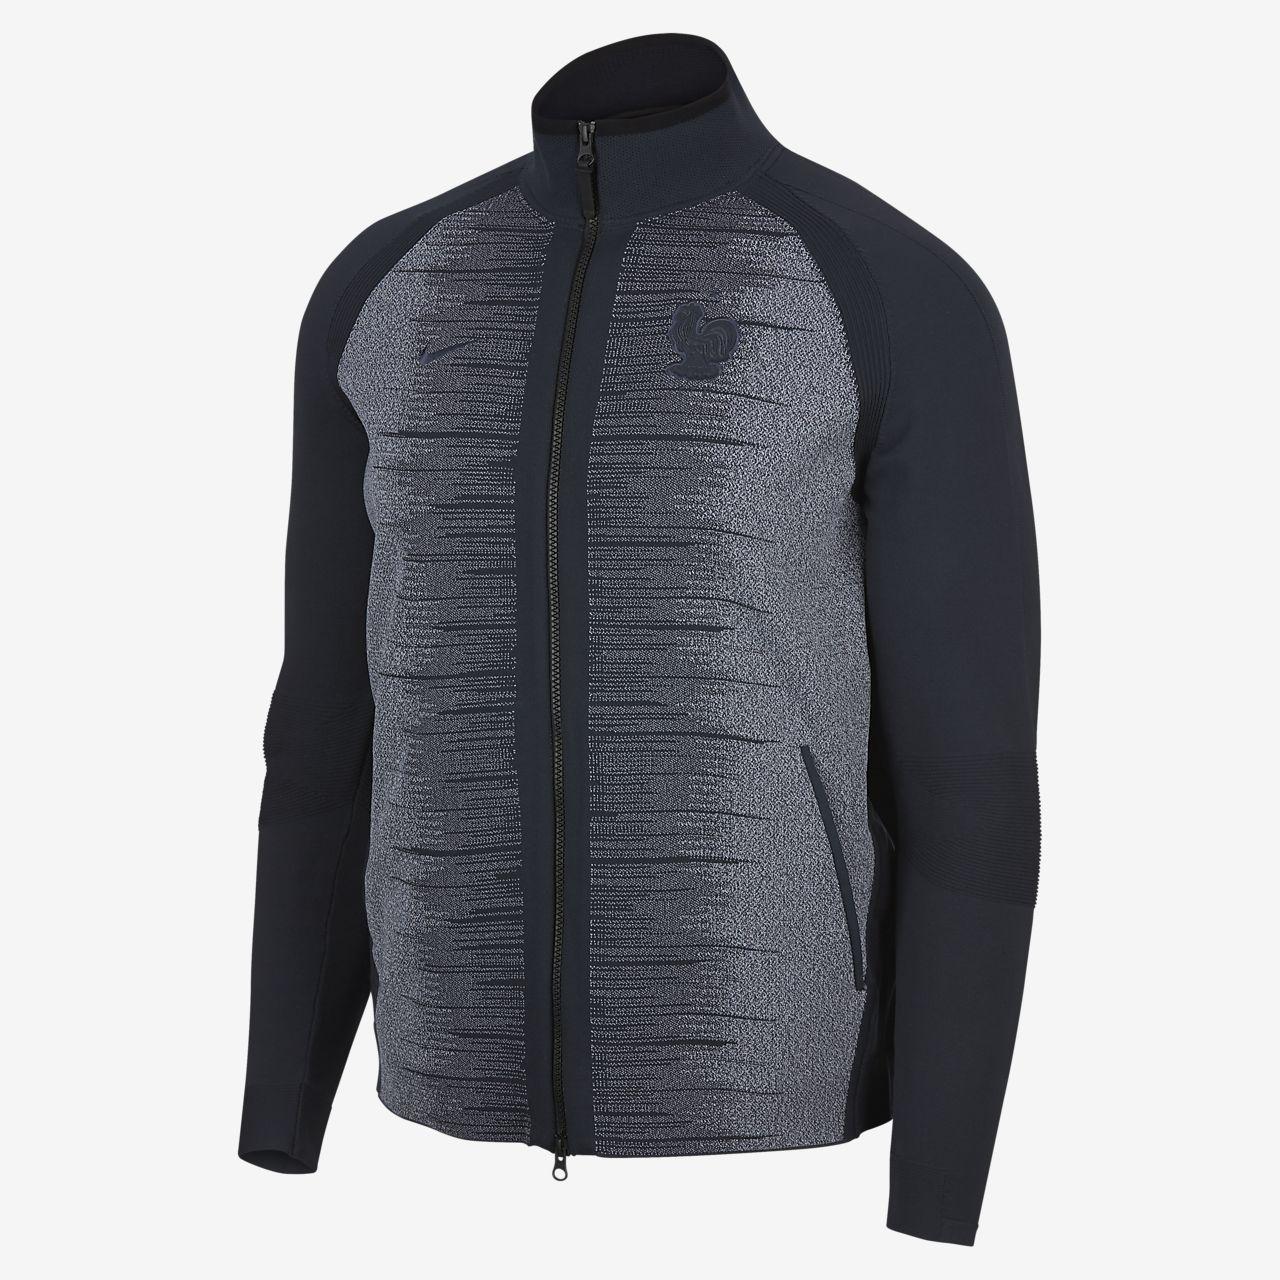 Blusão FFF Tech Knit para homem